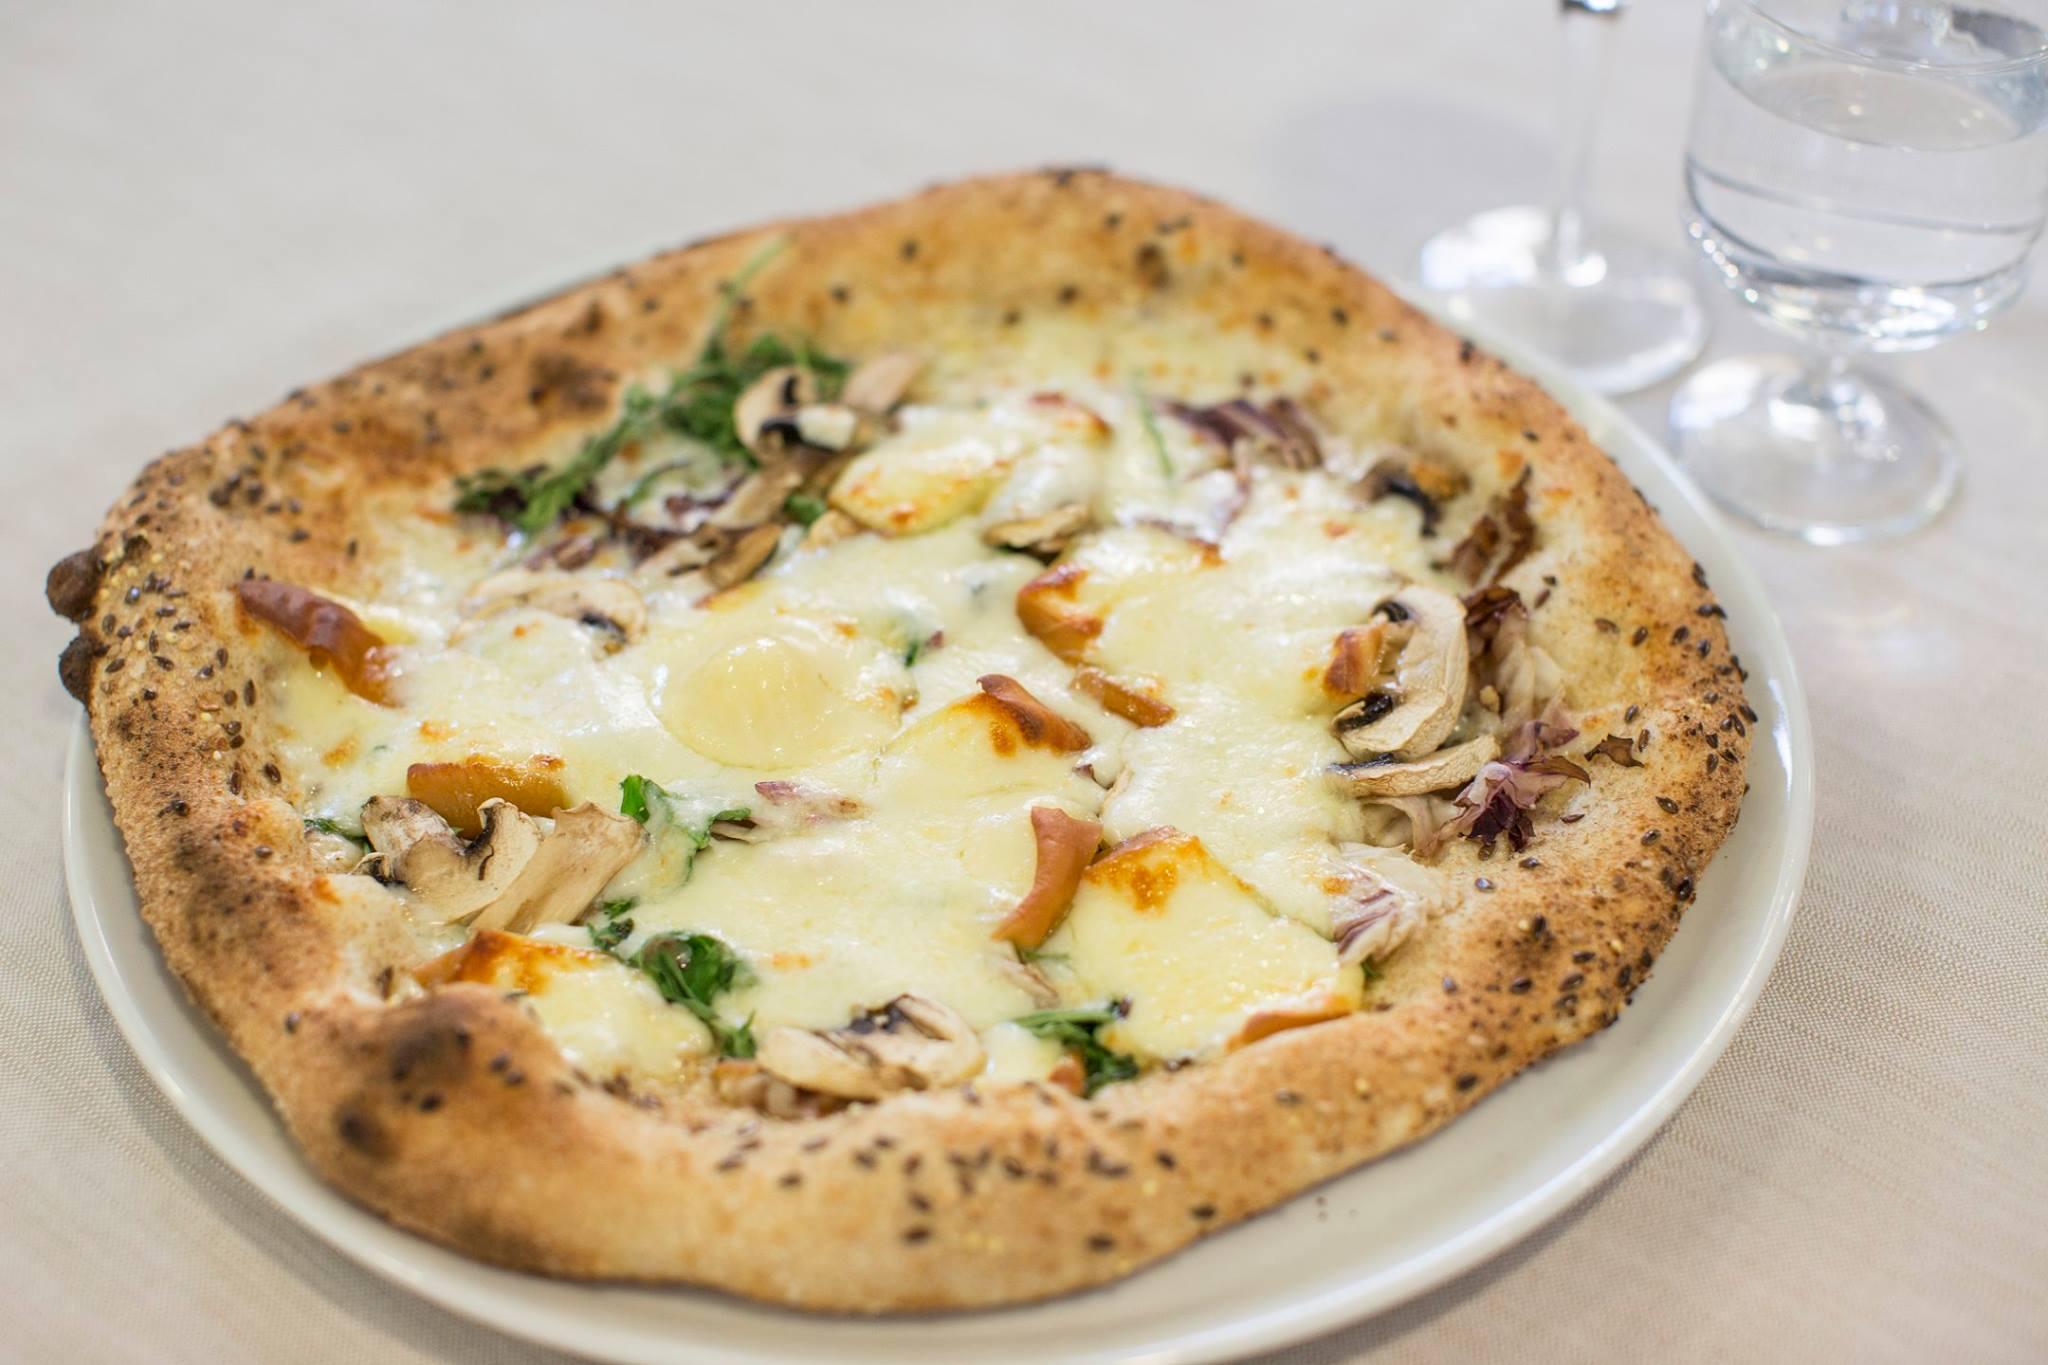 Pizza We Uaglio'